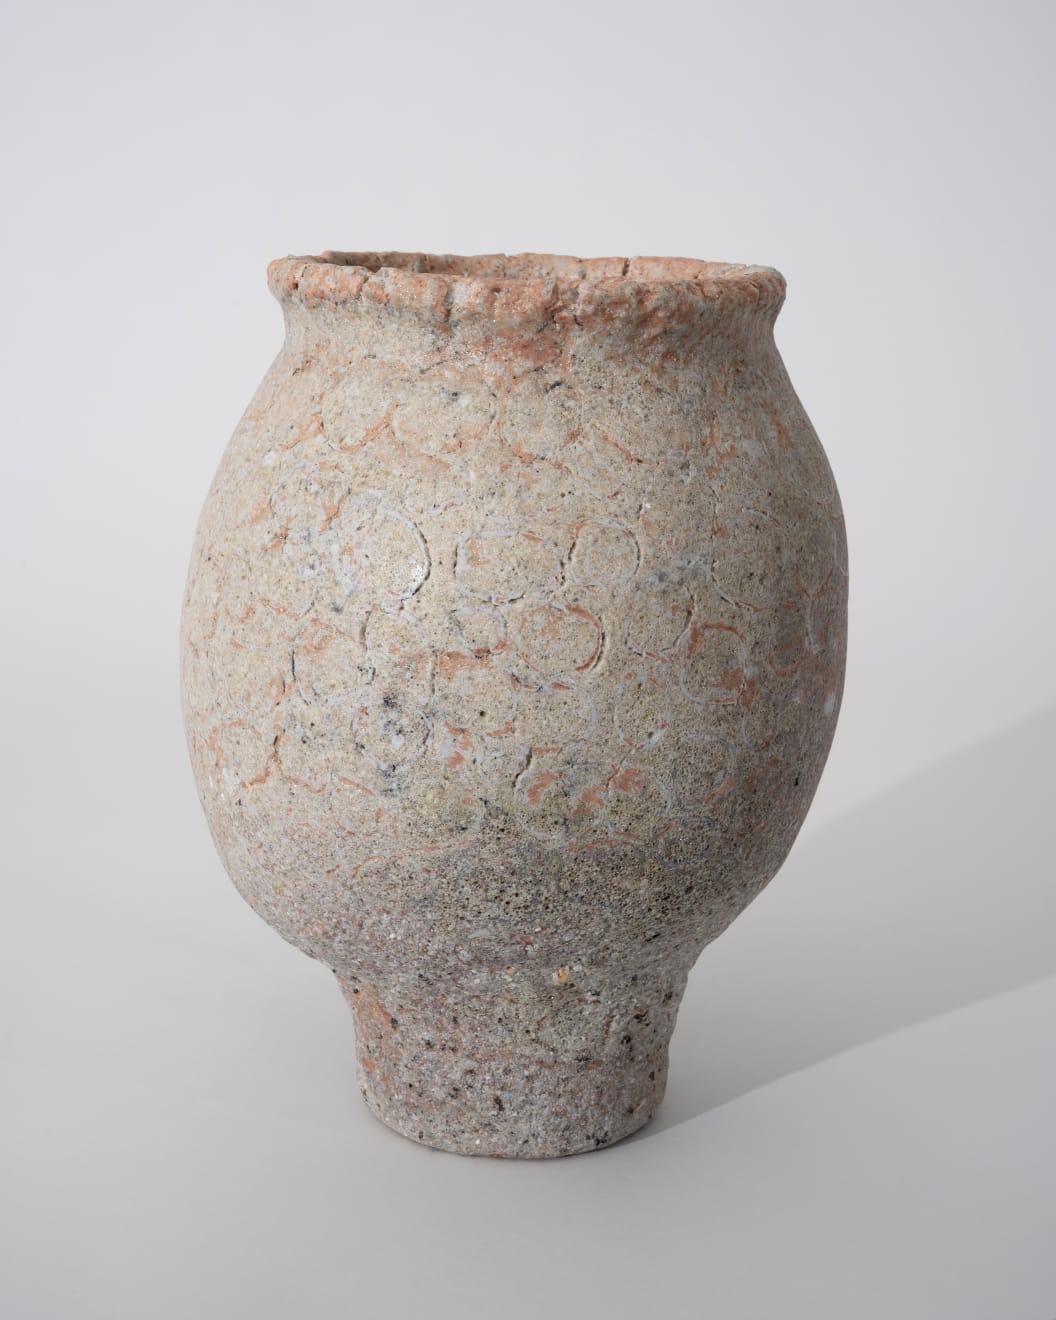 Masaomi Yasunaga, 石の器 / stone vessel, 2019